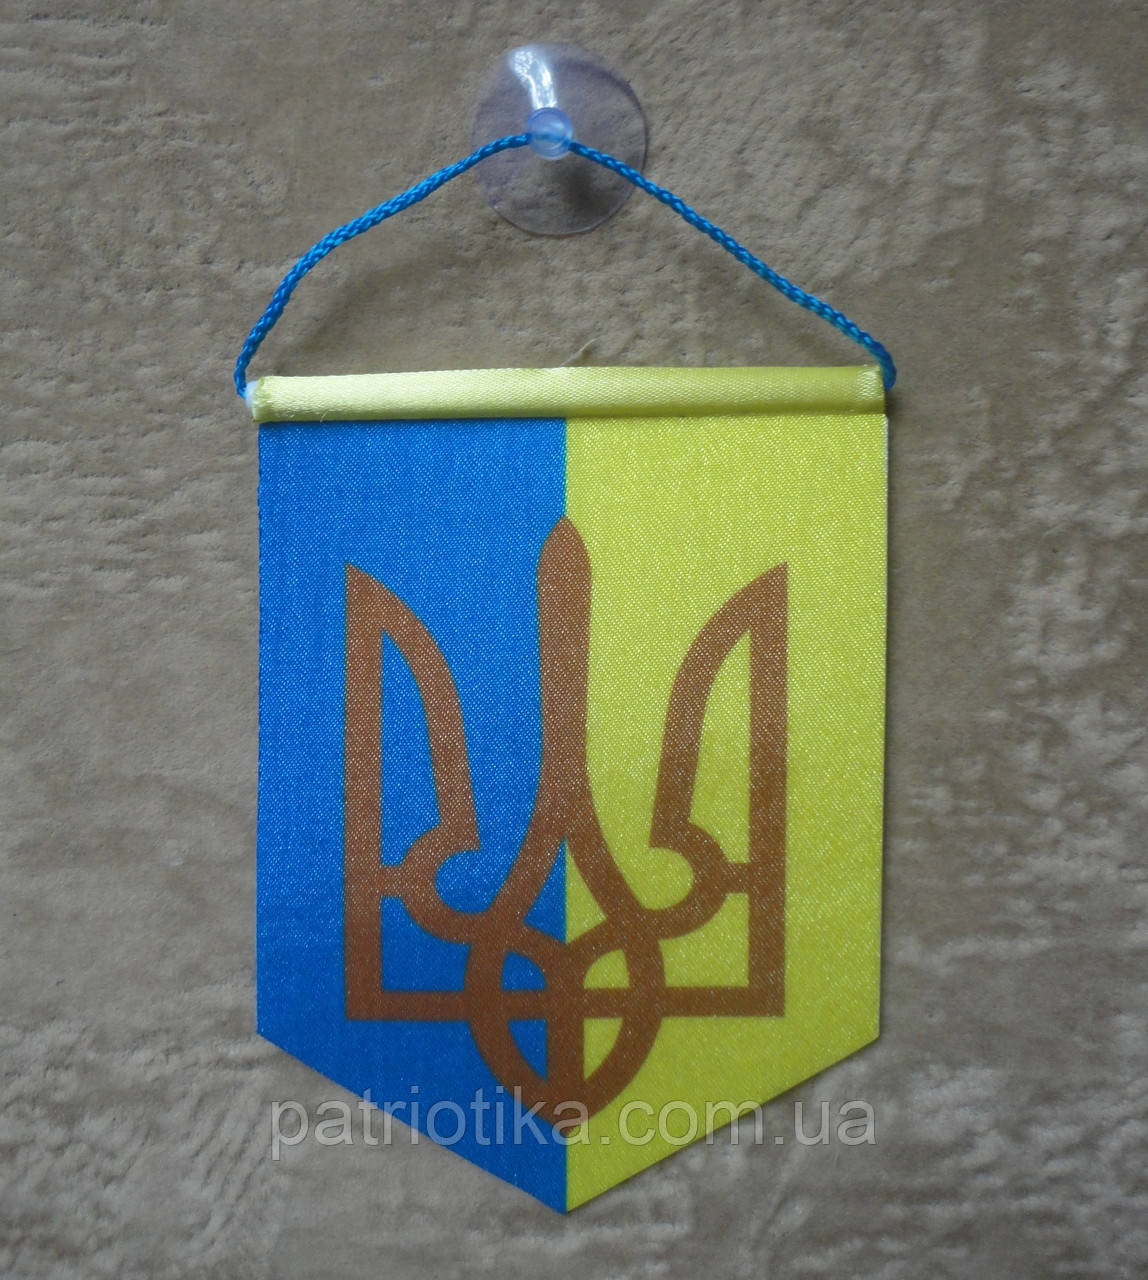 Вымпел Украины двухцветный | Вимпел України двоколірний 11х8 см